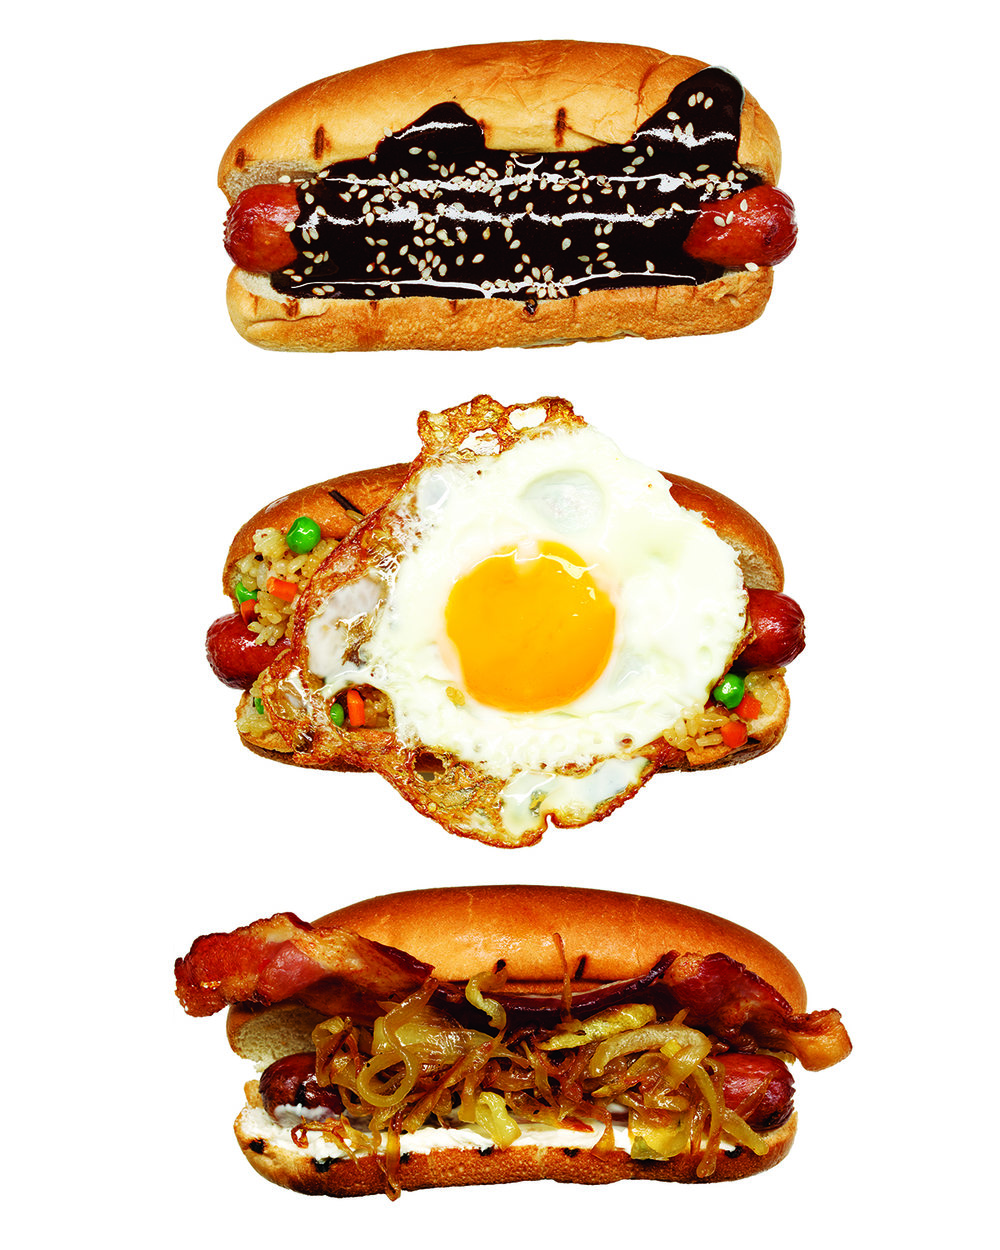 jeffreymschad_hotdogs.jpg